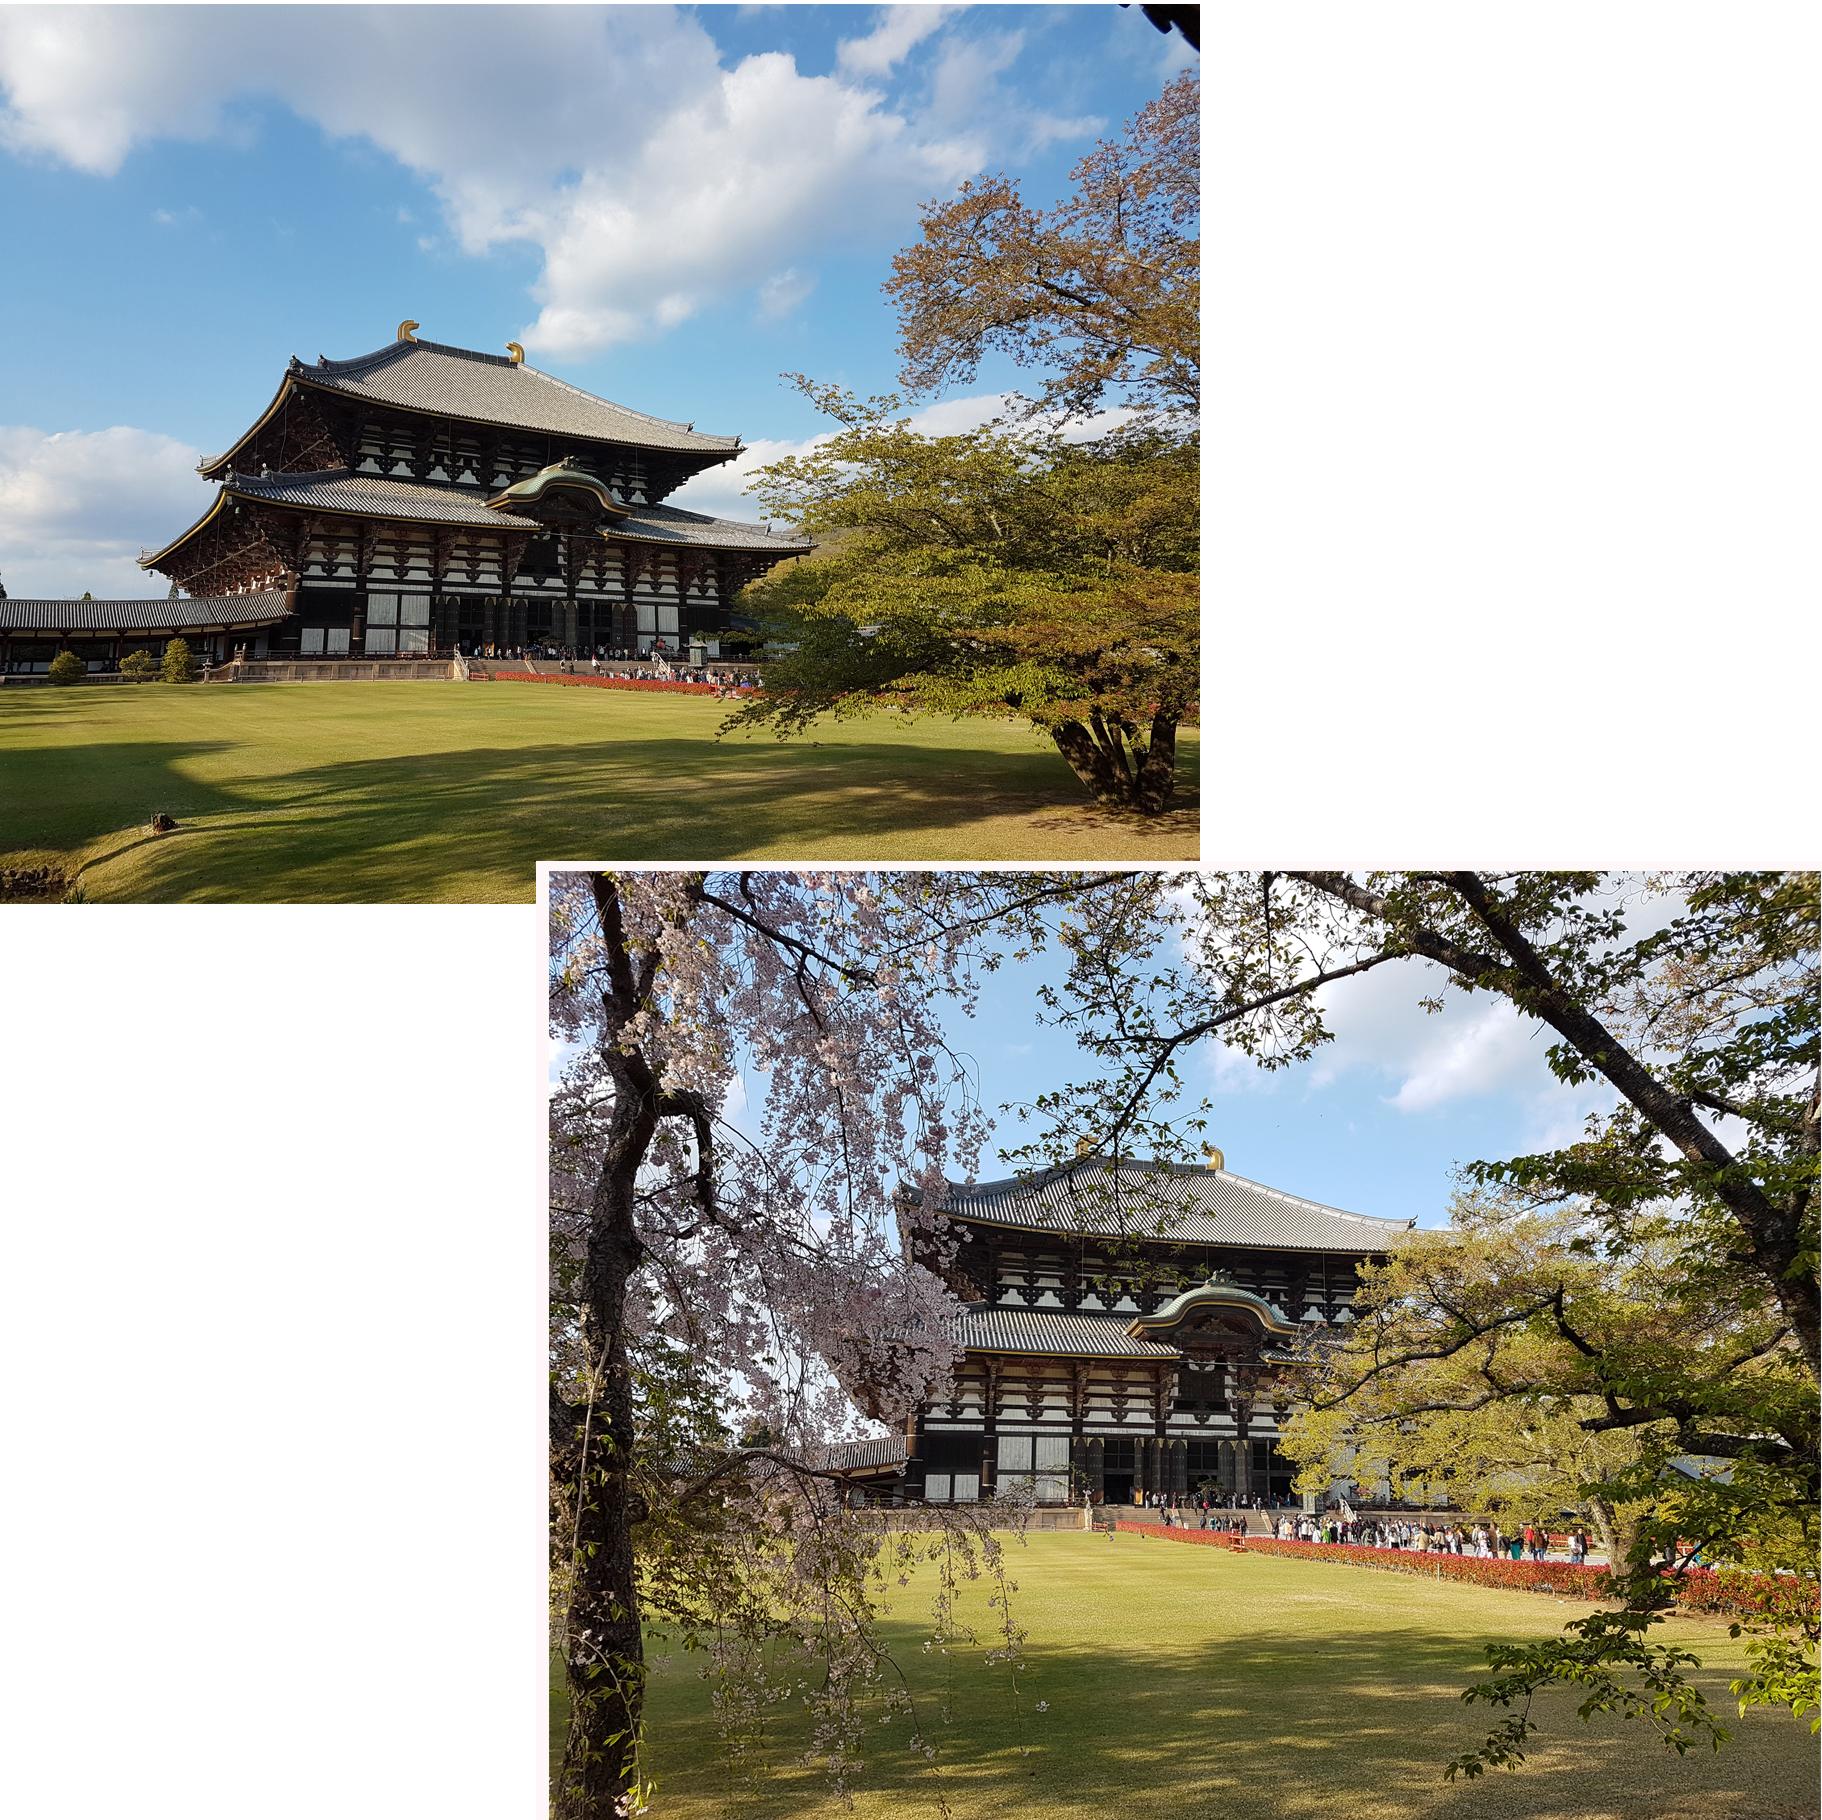 Main hall (Daibutsuden) of Todaiji